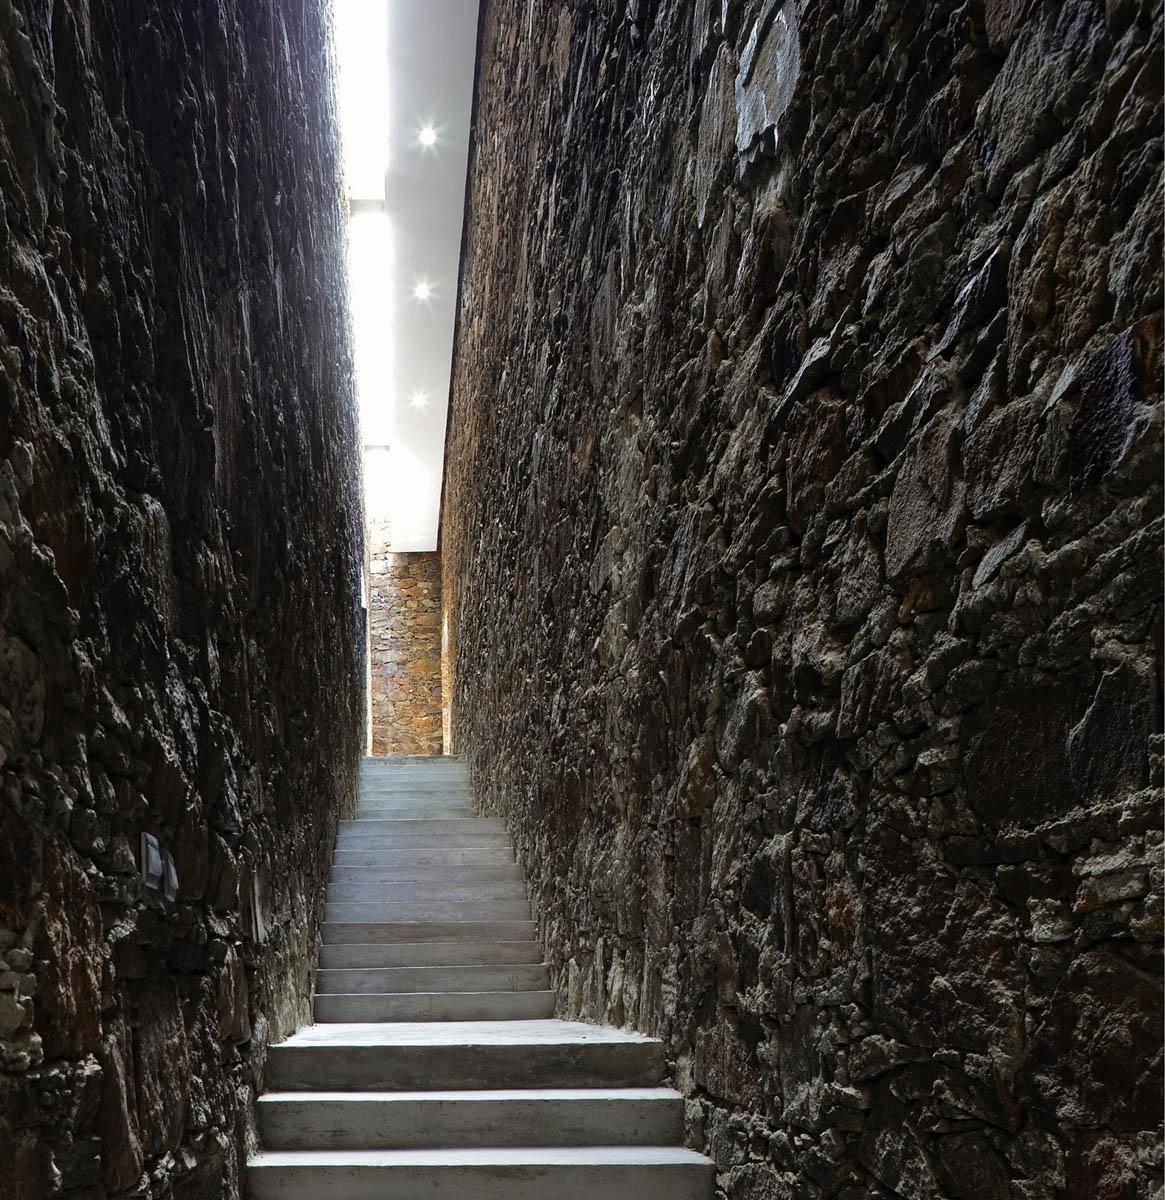 Zhang Ke tibet namcha barwa visitor centre 01 1165x1200 c